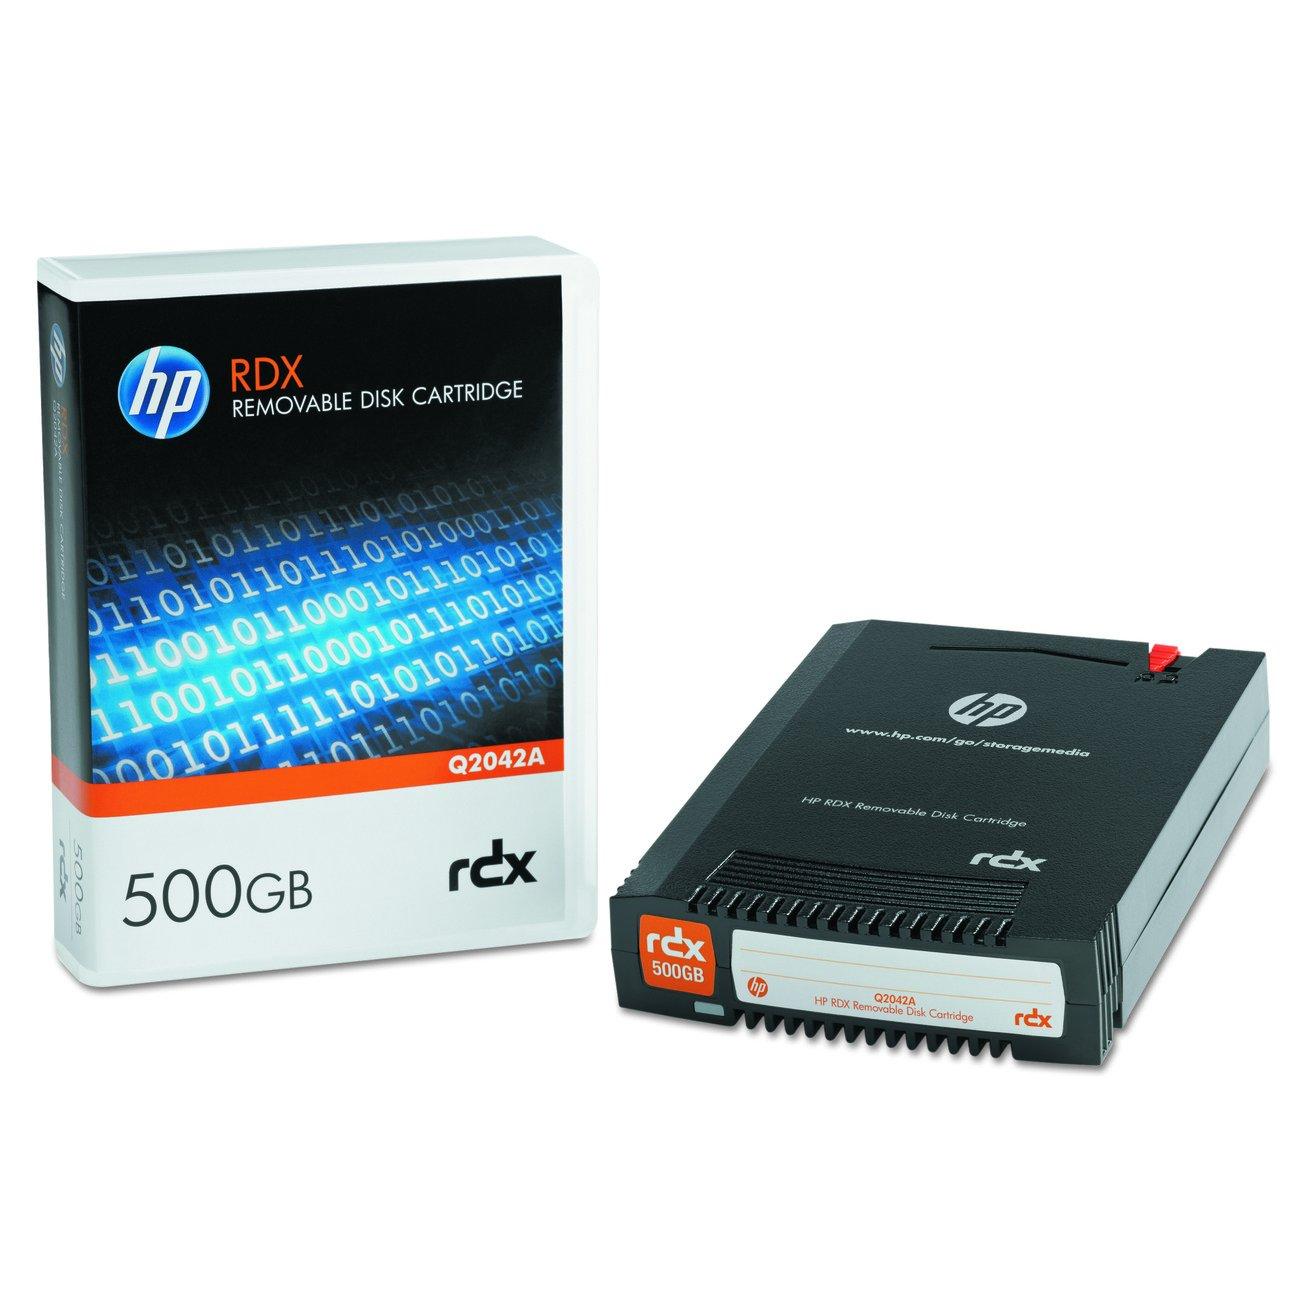 2V28895 - HP 500 GB 2.5quot; RDX Technology Internal Hard Drive Cartridge